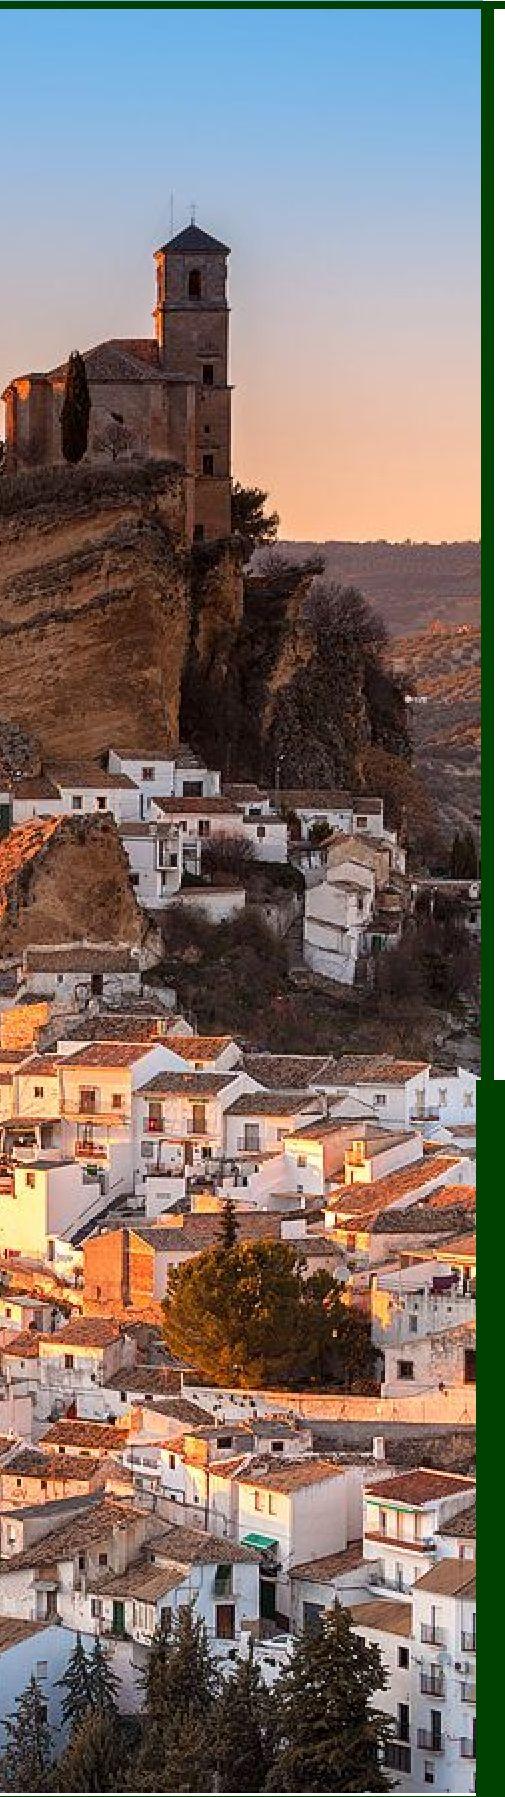 Montefrio - Granada, Spain